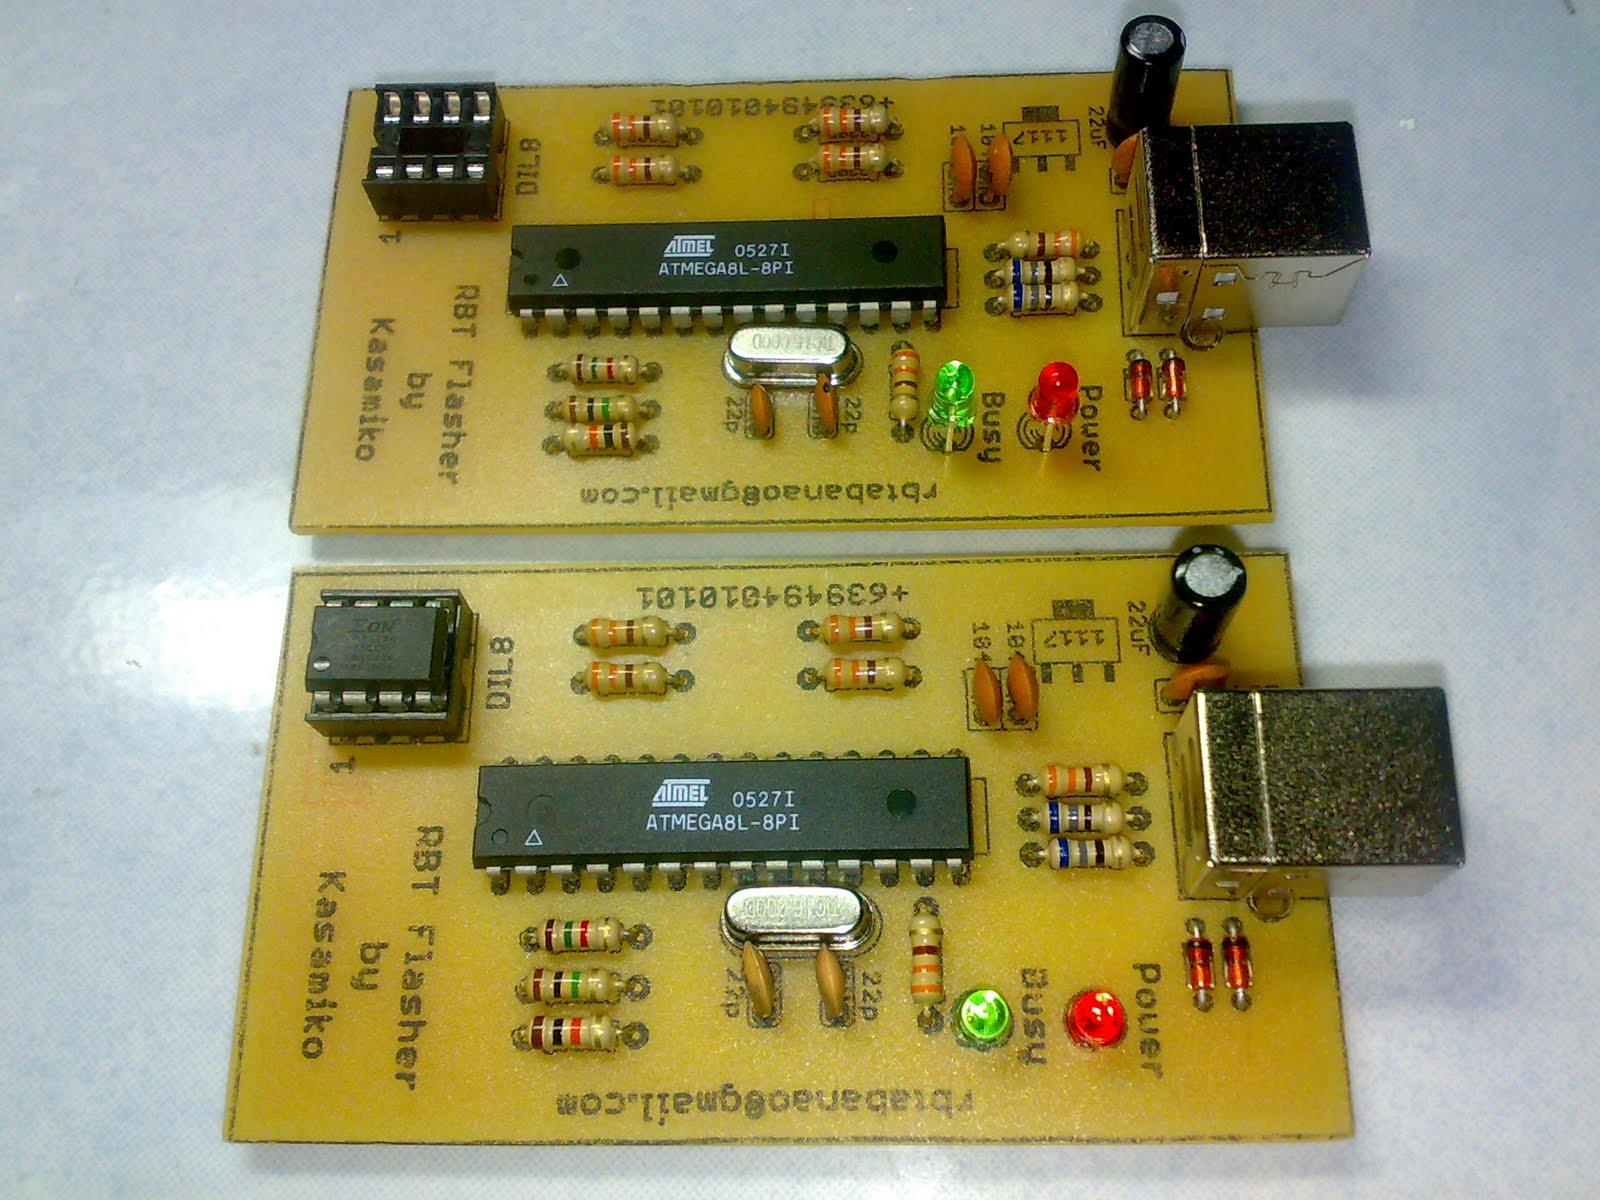 RBT's Tech Depot: USB SPI Flasher by RBT(c) ON SALE!